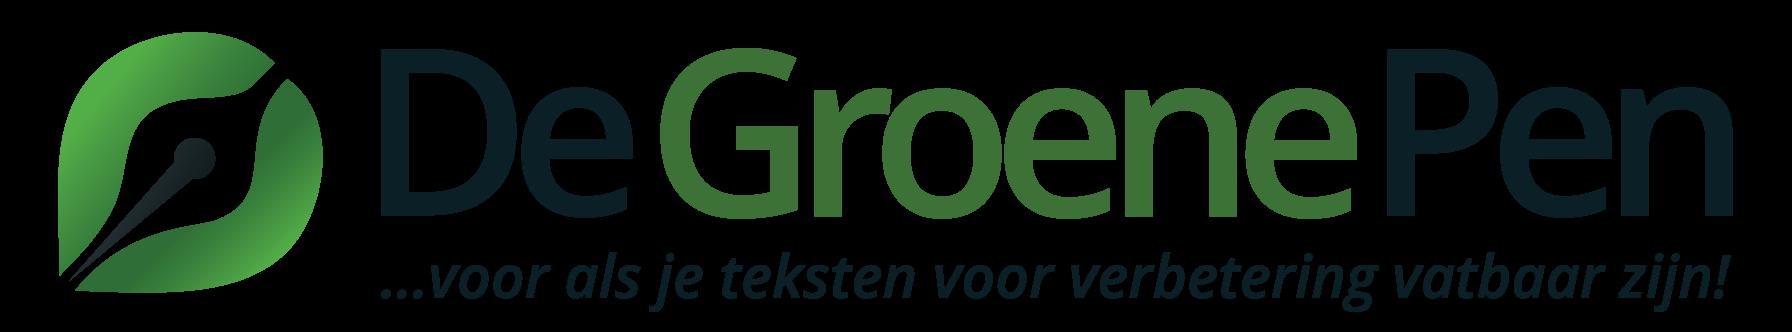 de-groene-logo.png